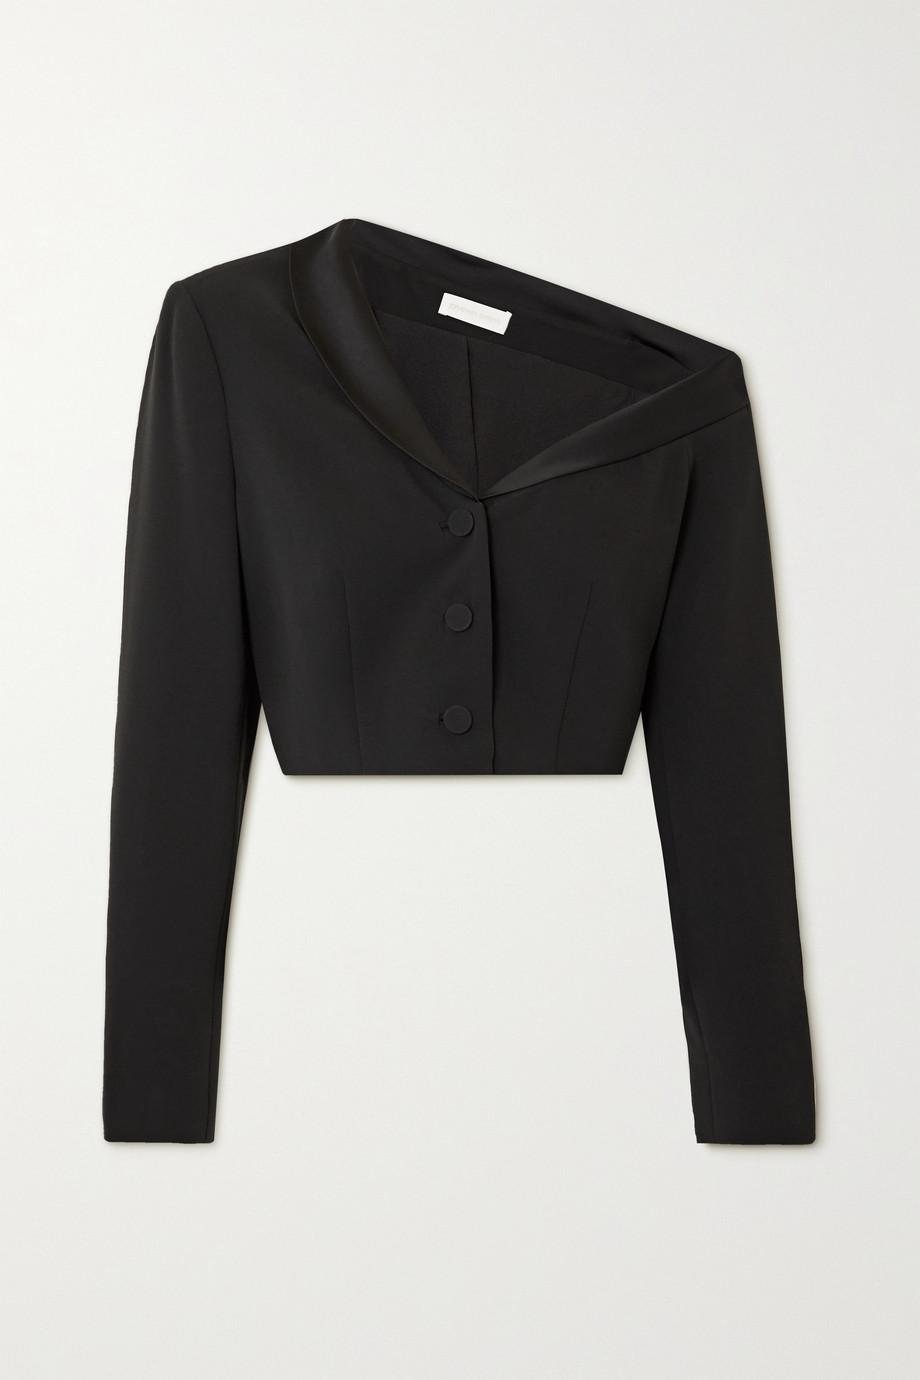 Jonathan Simkhai Sloane one-shoulder cropped satin-trimmed crepe blazer